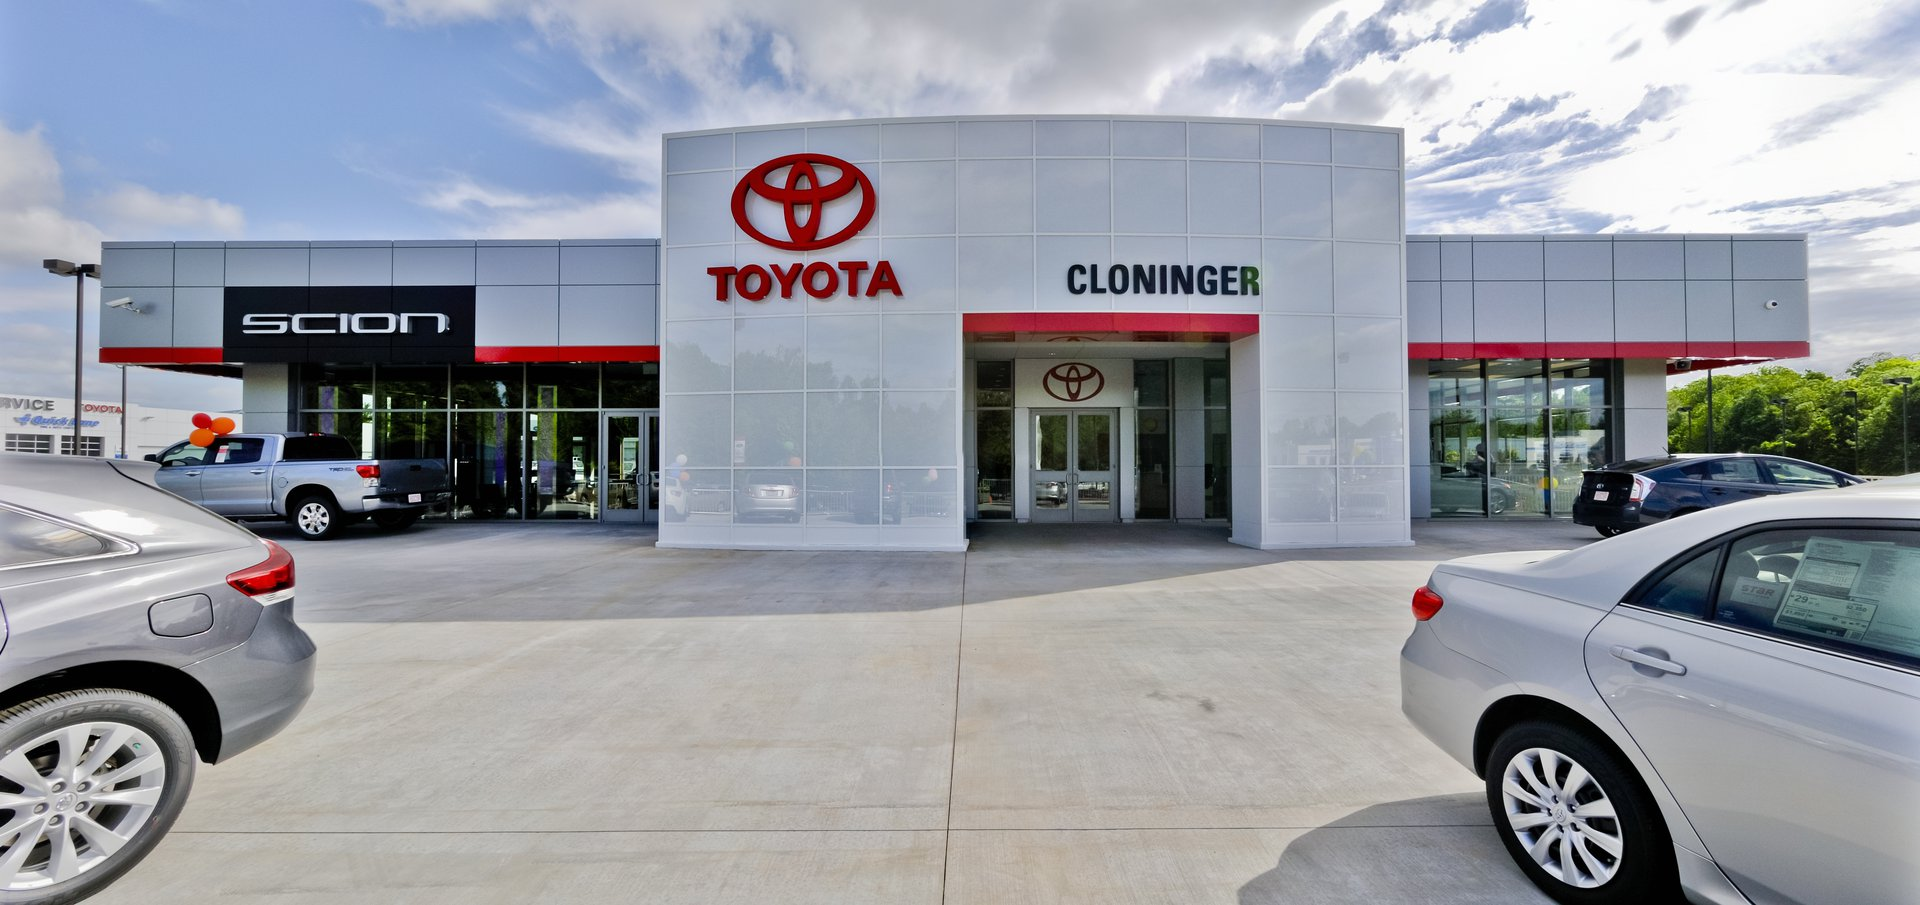 Cloninger Toyota Salisbury, NC